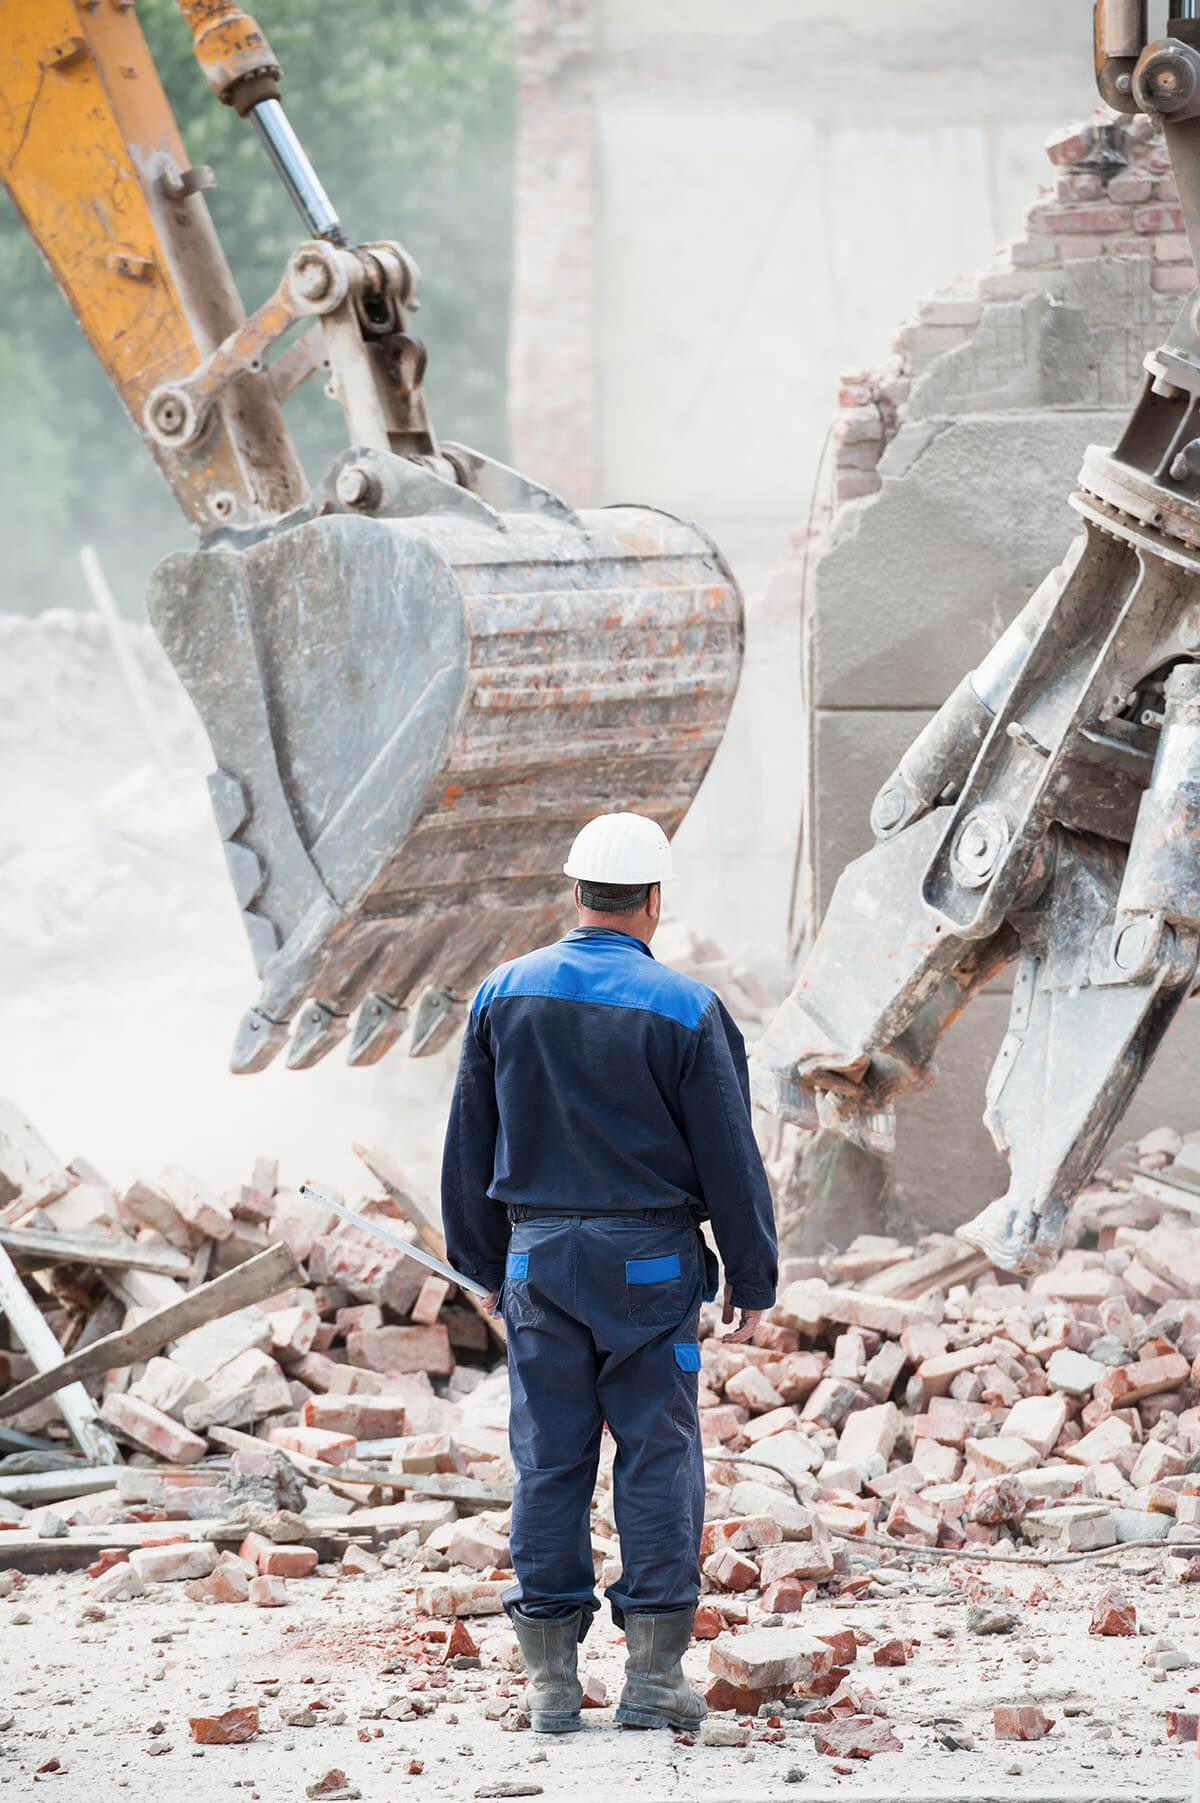 Excavator hire, man at building demolition site